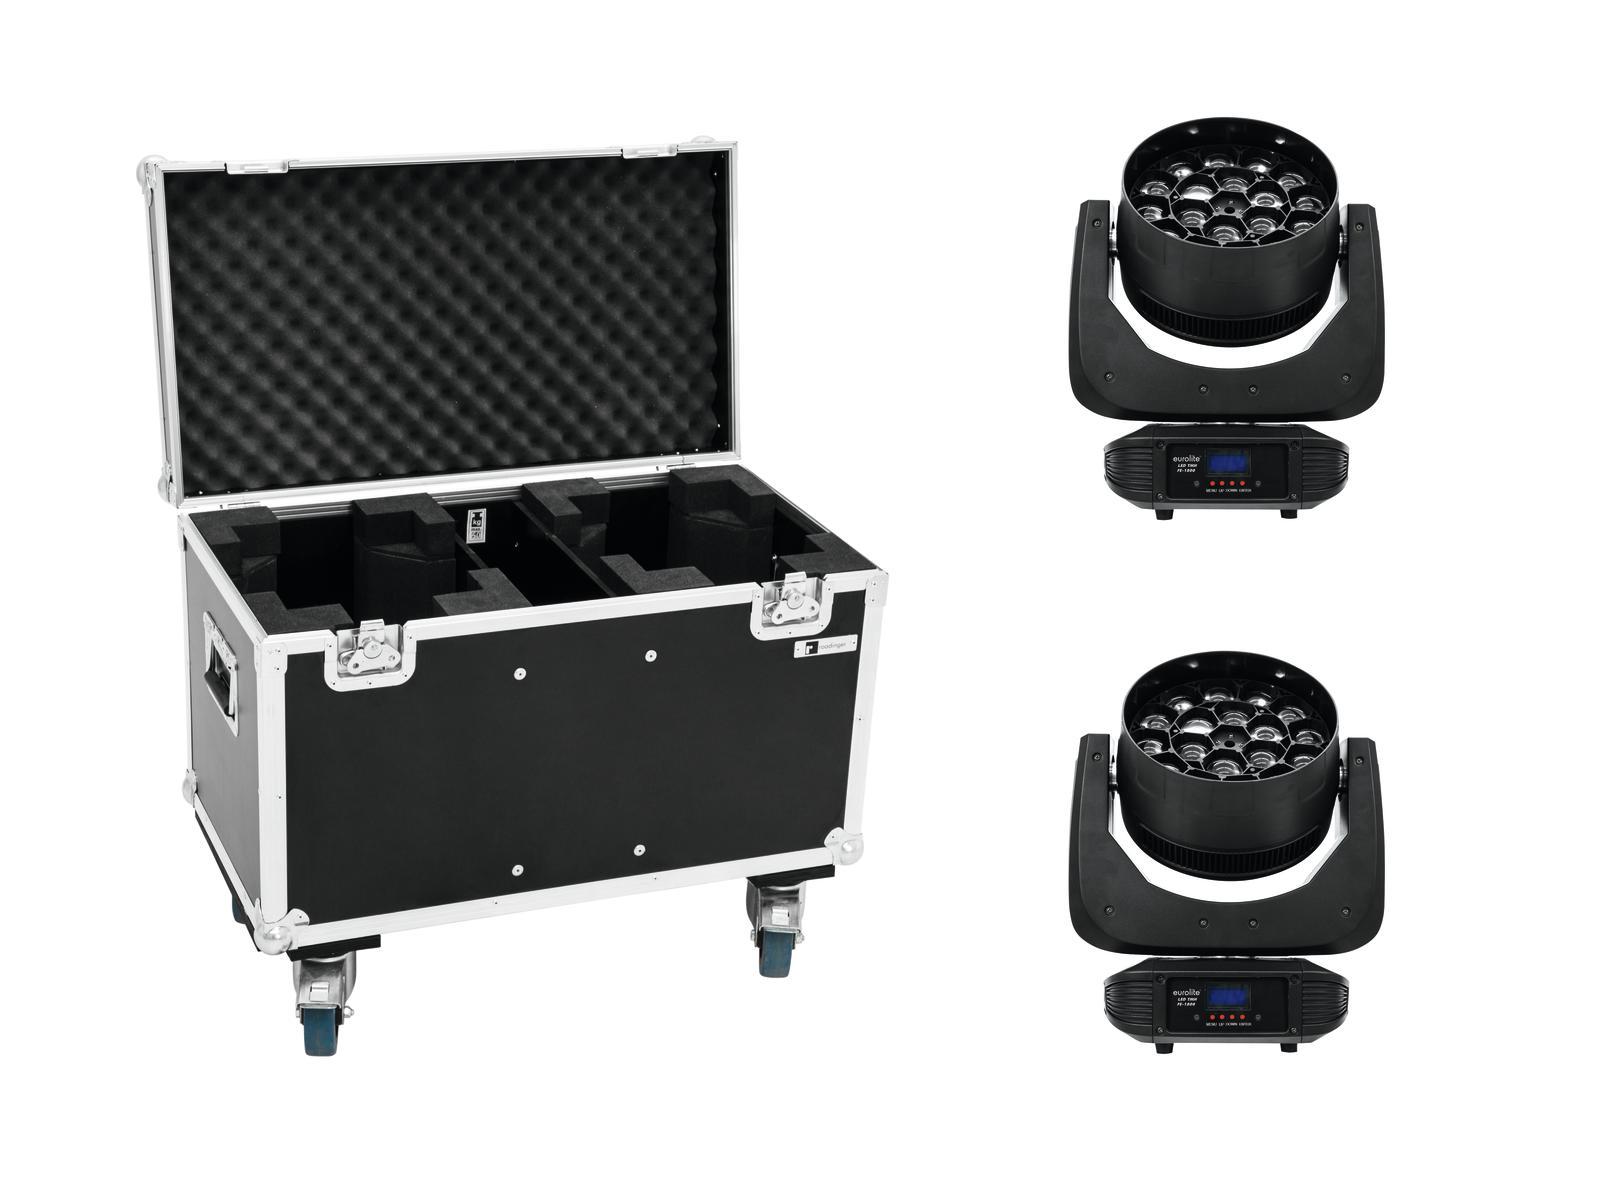 EUROLITE Set 2x LED TMH FE-1800 + Caso